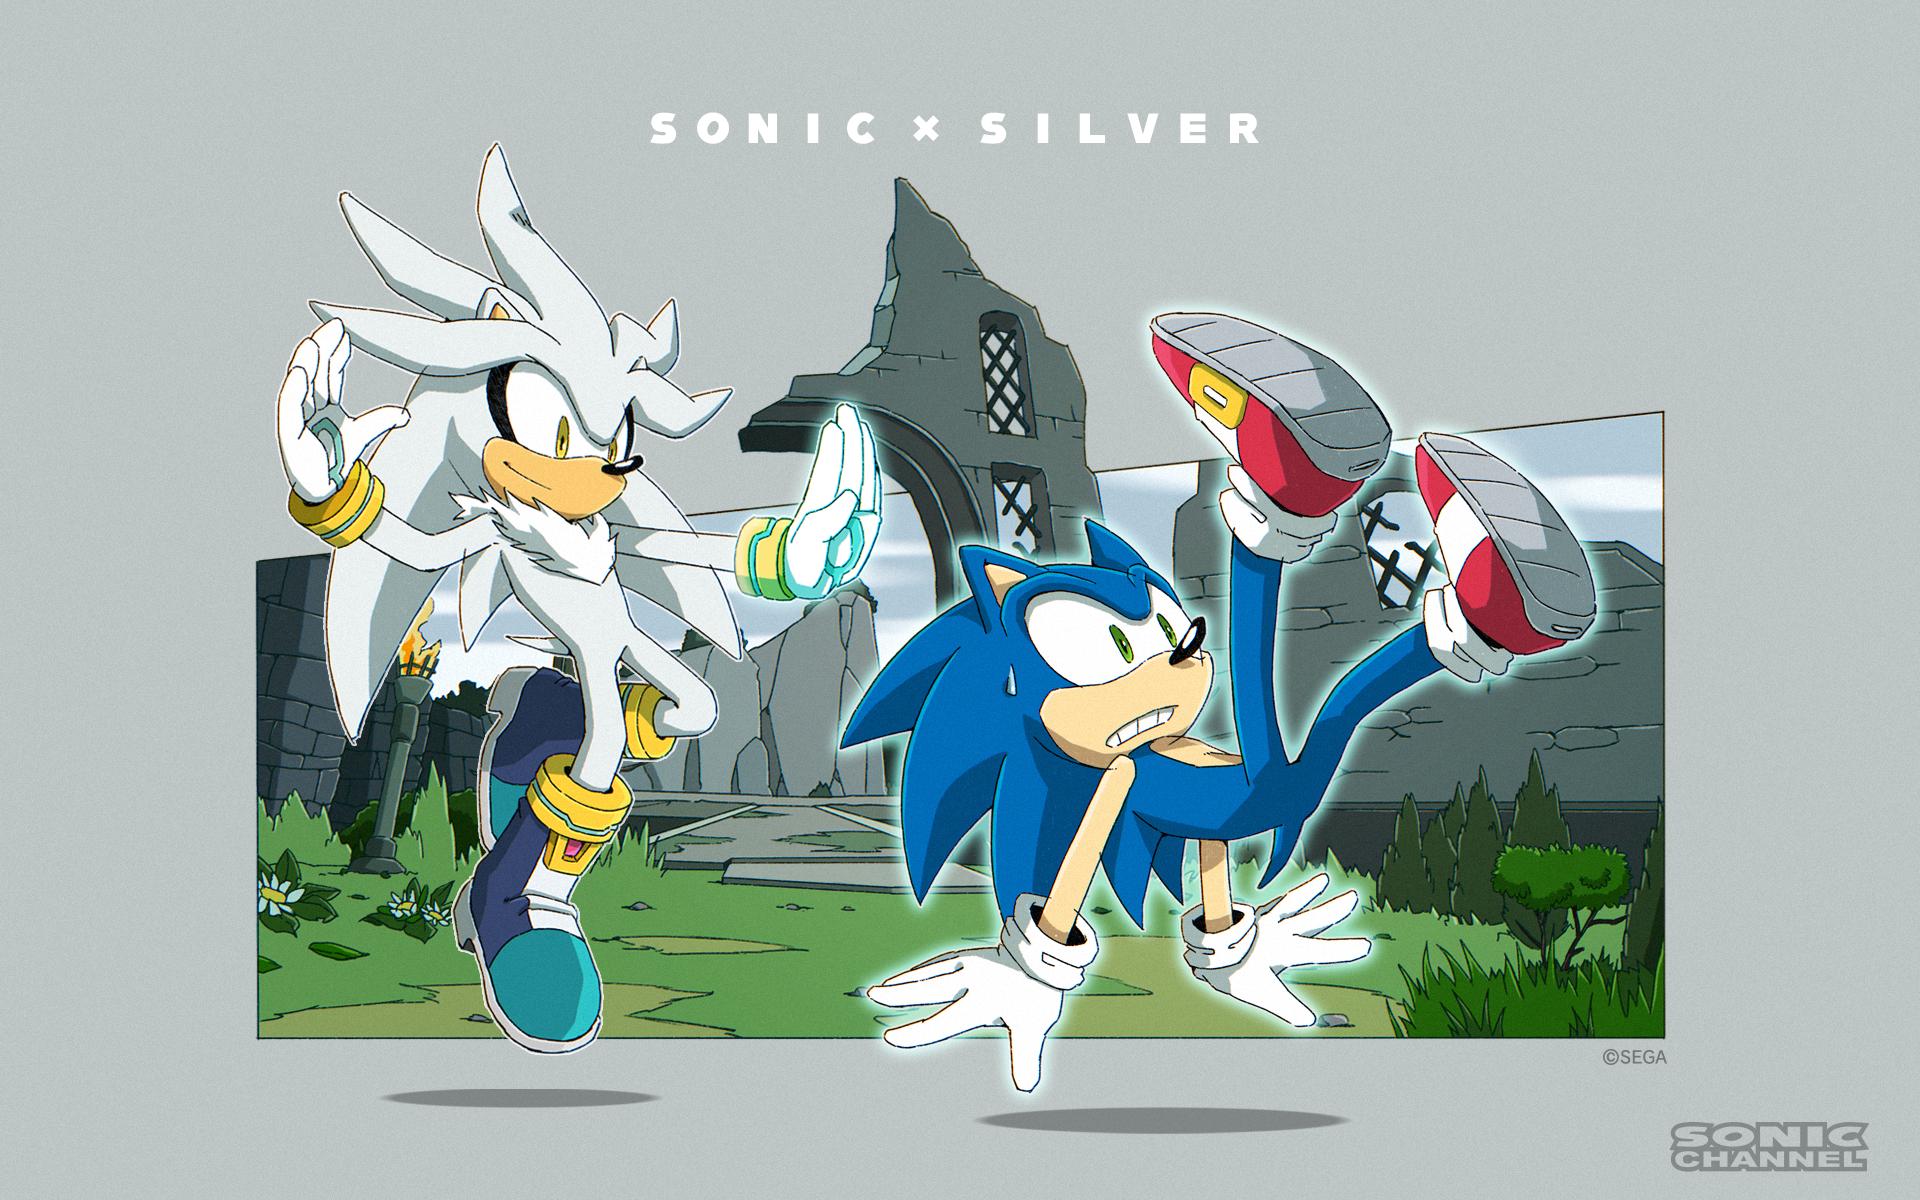 https://sonic.sega.jp/SonicChannel/enjoy/image/wallpaper_203_silver_15_pc.png